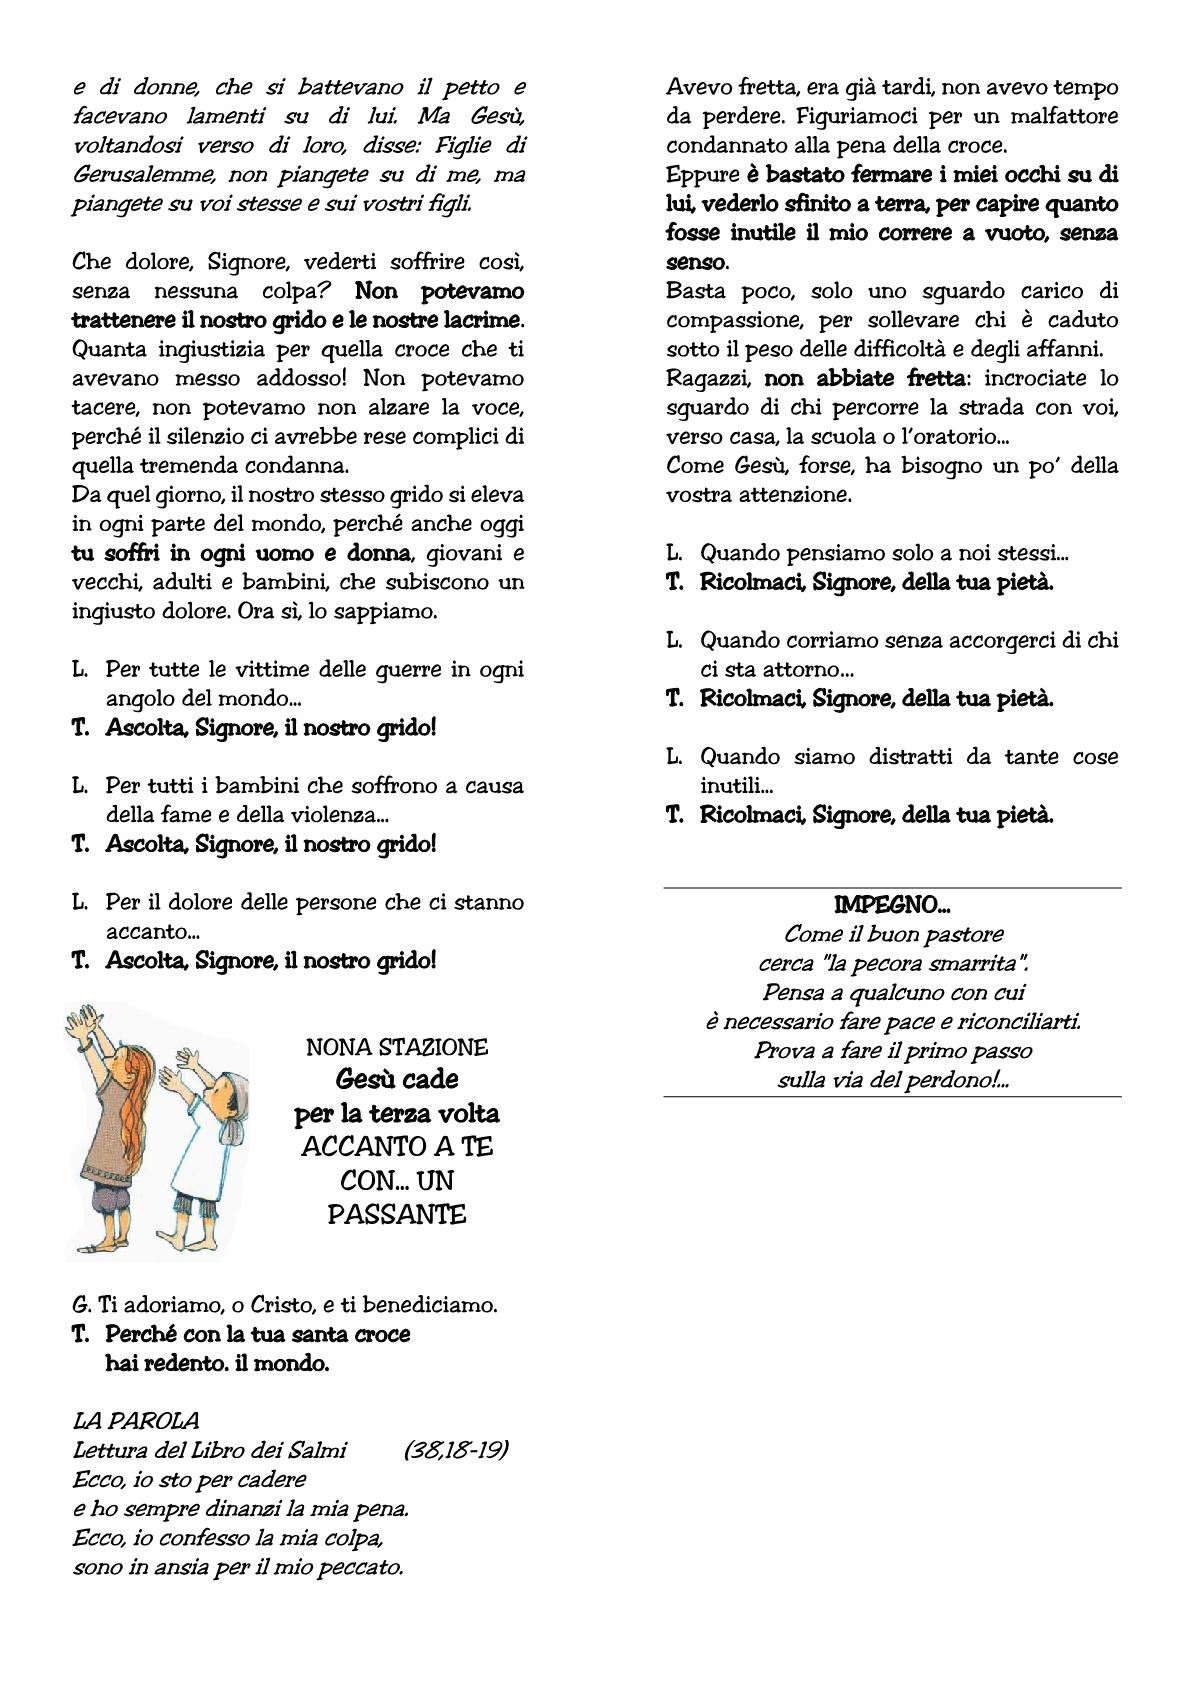 Via Crucis raga III venerdì2